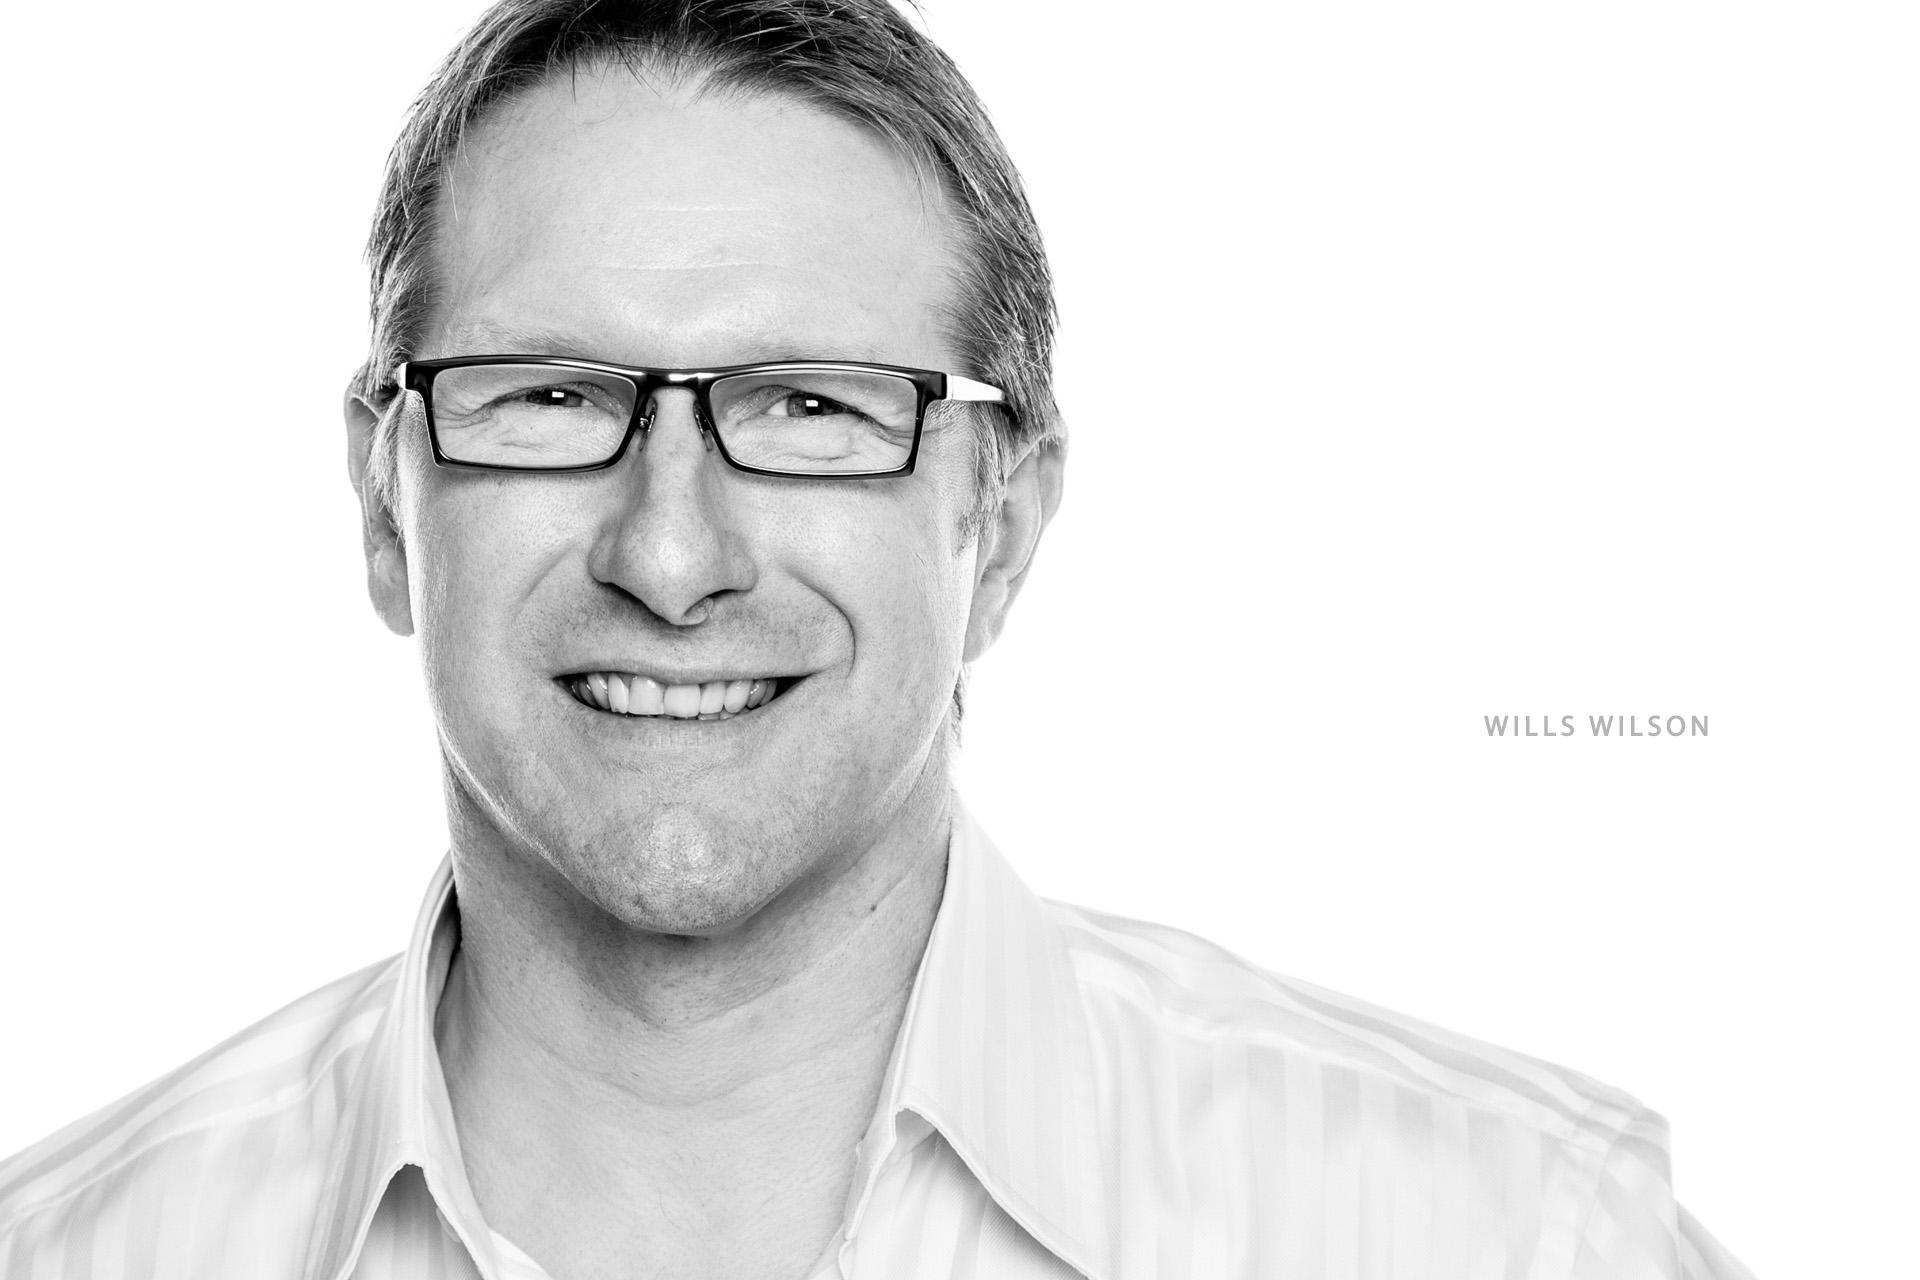 William Wilson Photography